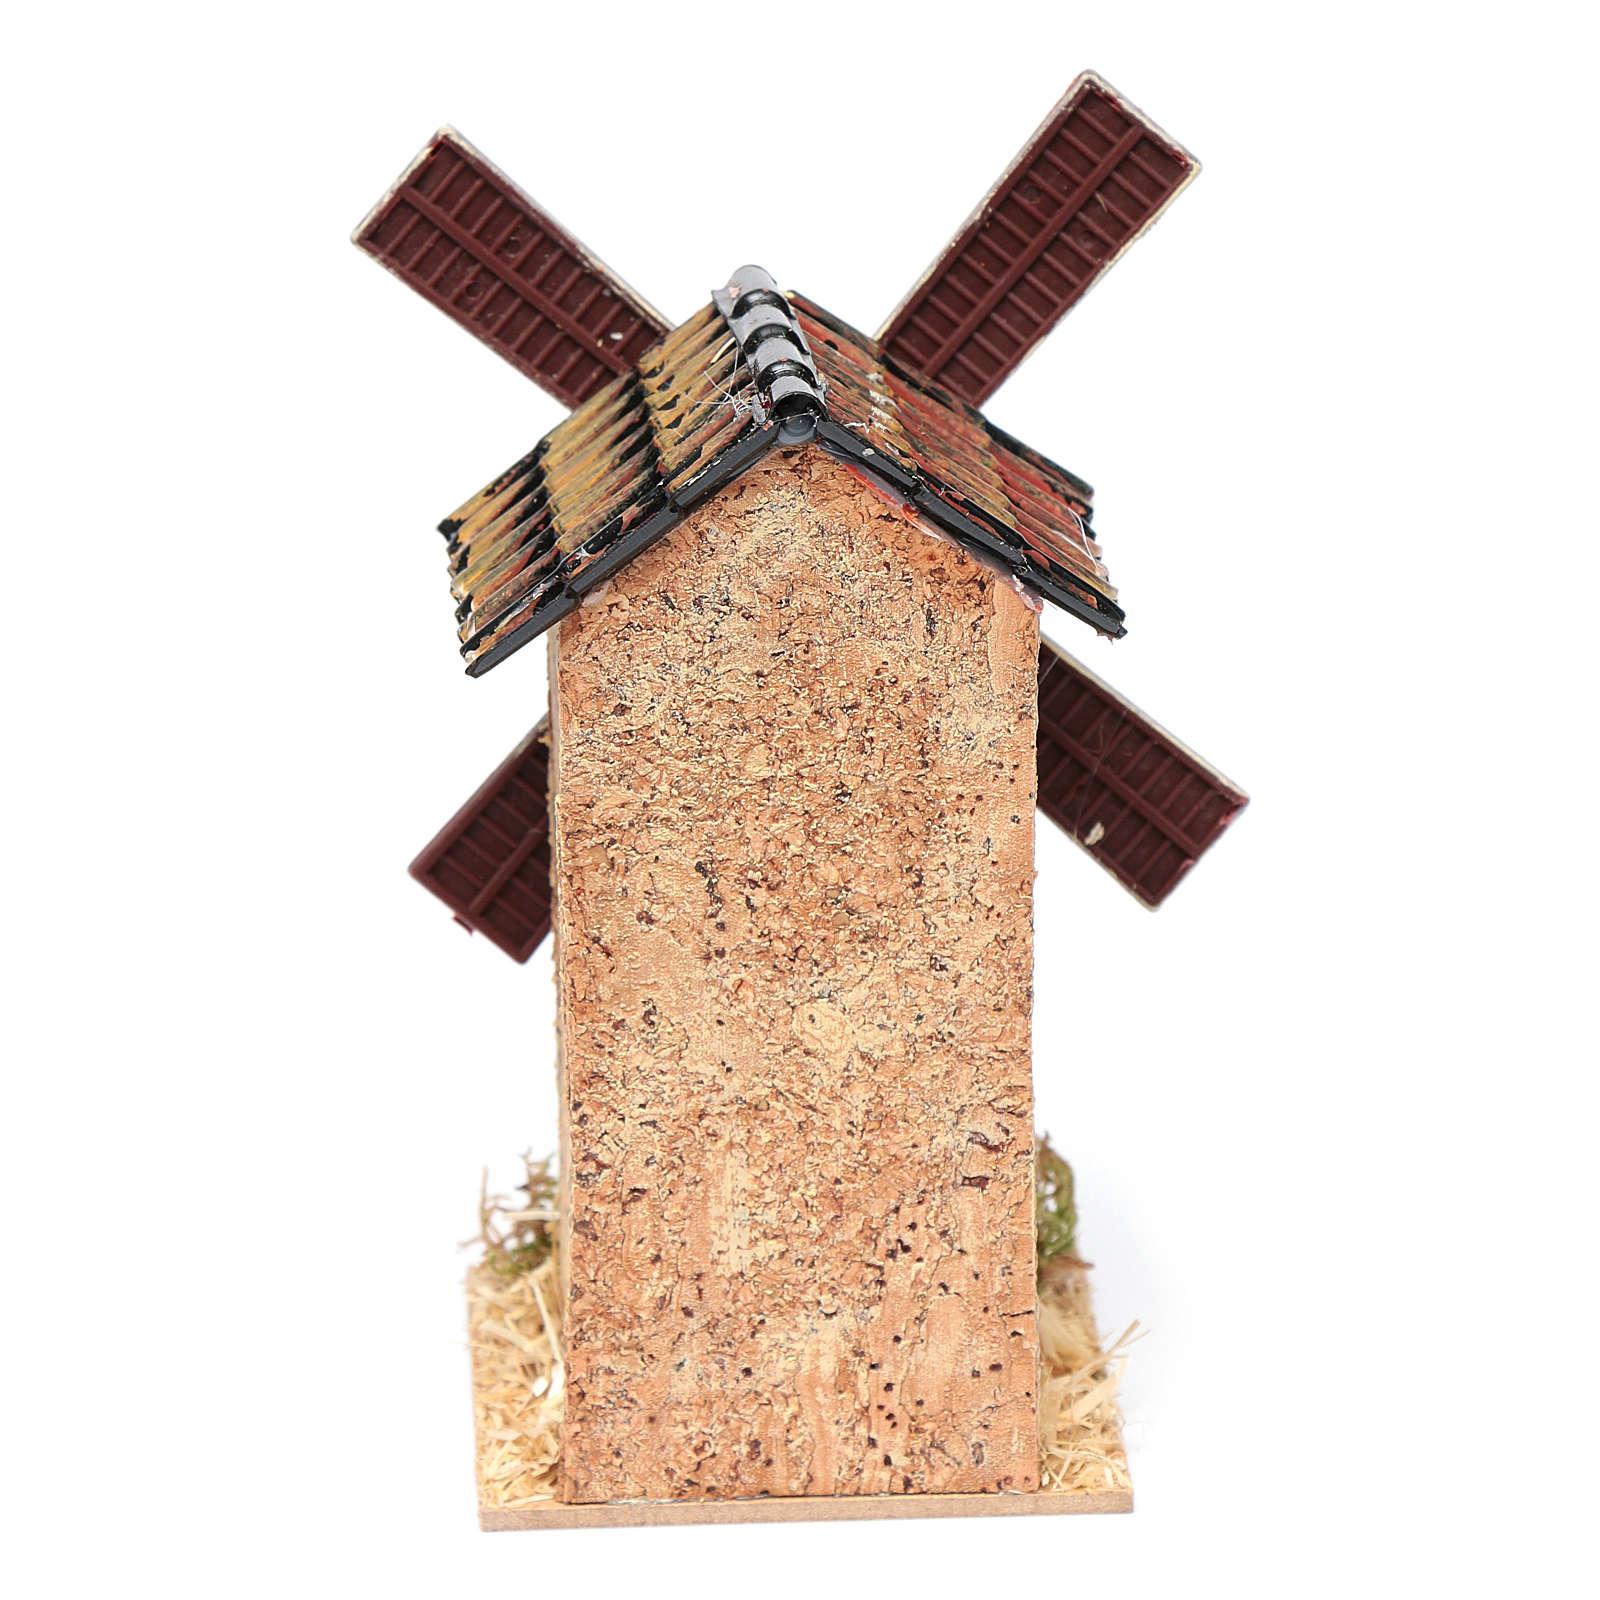 Molino de viento falso de corcho belén 10x5x5 4